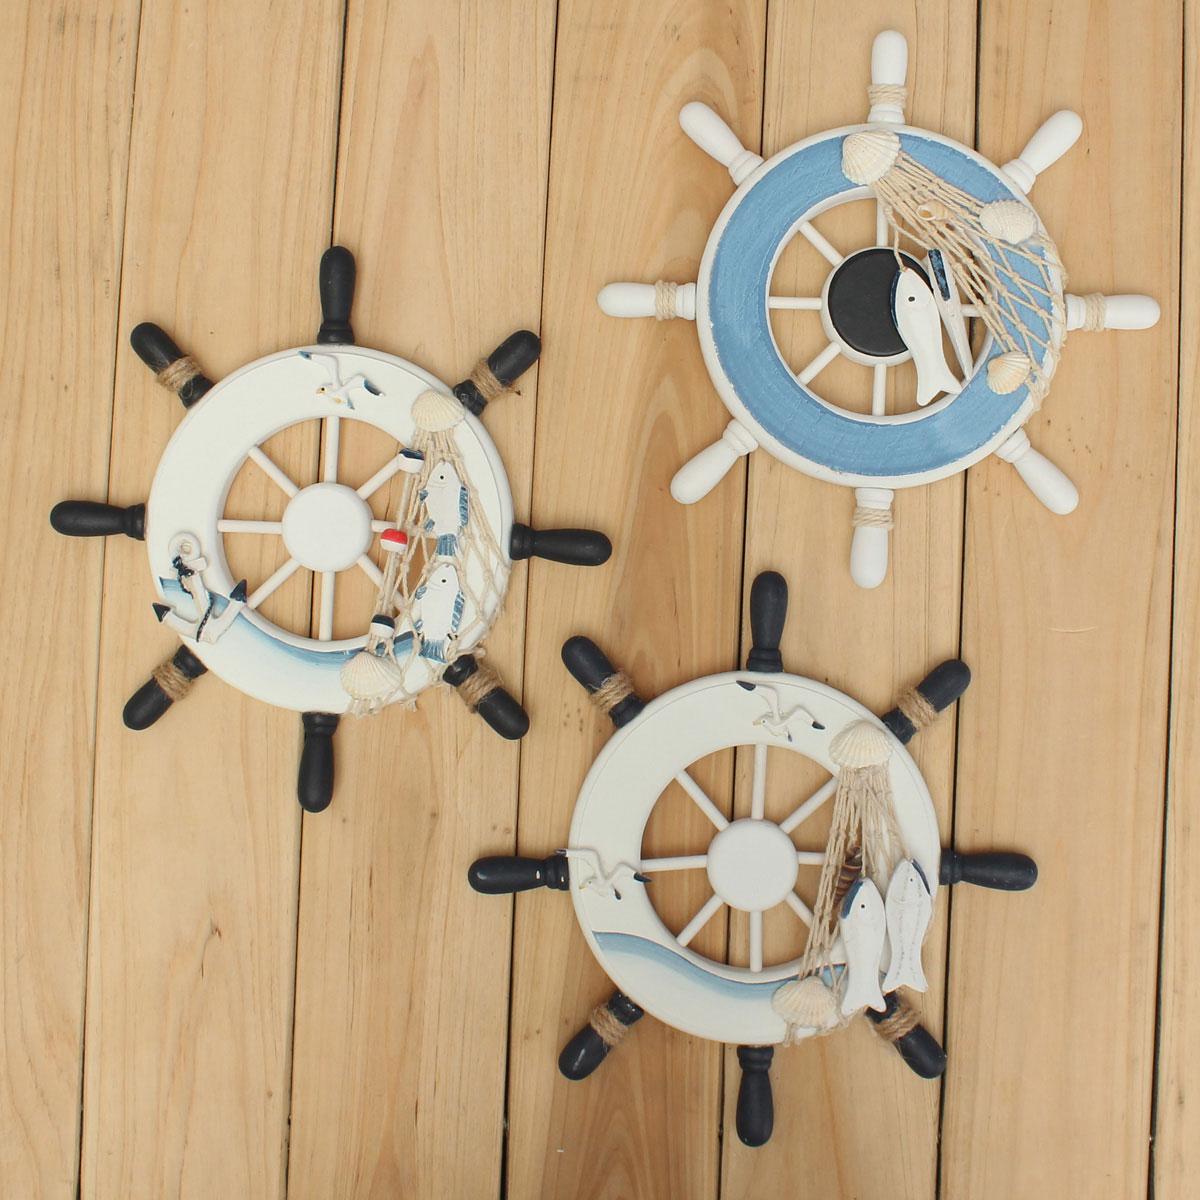 wood boat ship wheel nautical decoration beach home rudder wall hanging decor intl lazada ph. Black Bedroom Furniture Sets. Home Design Ideas